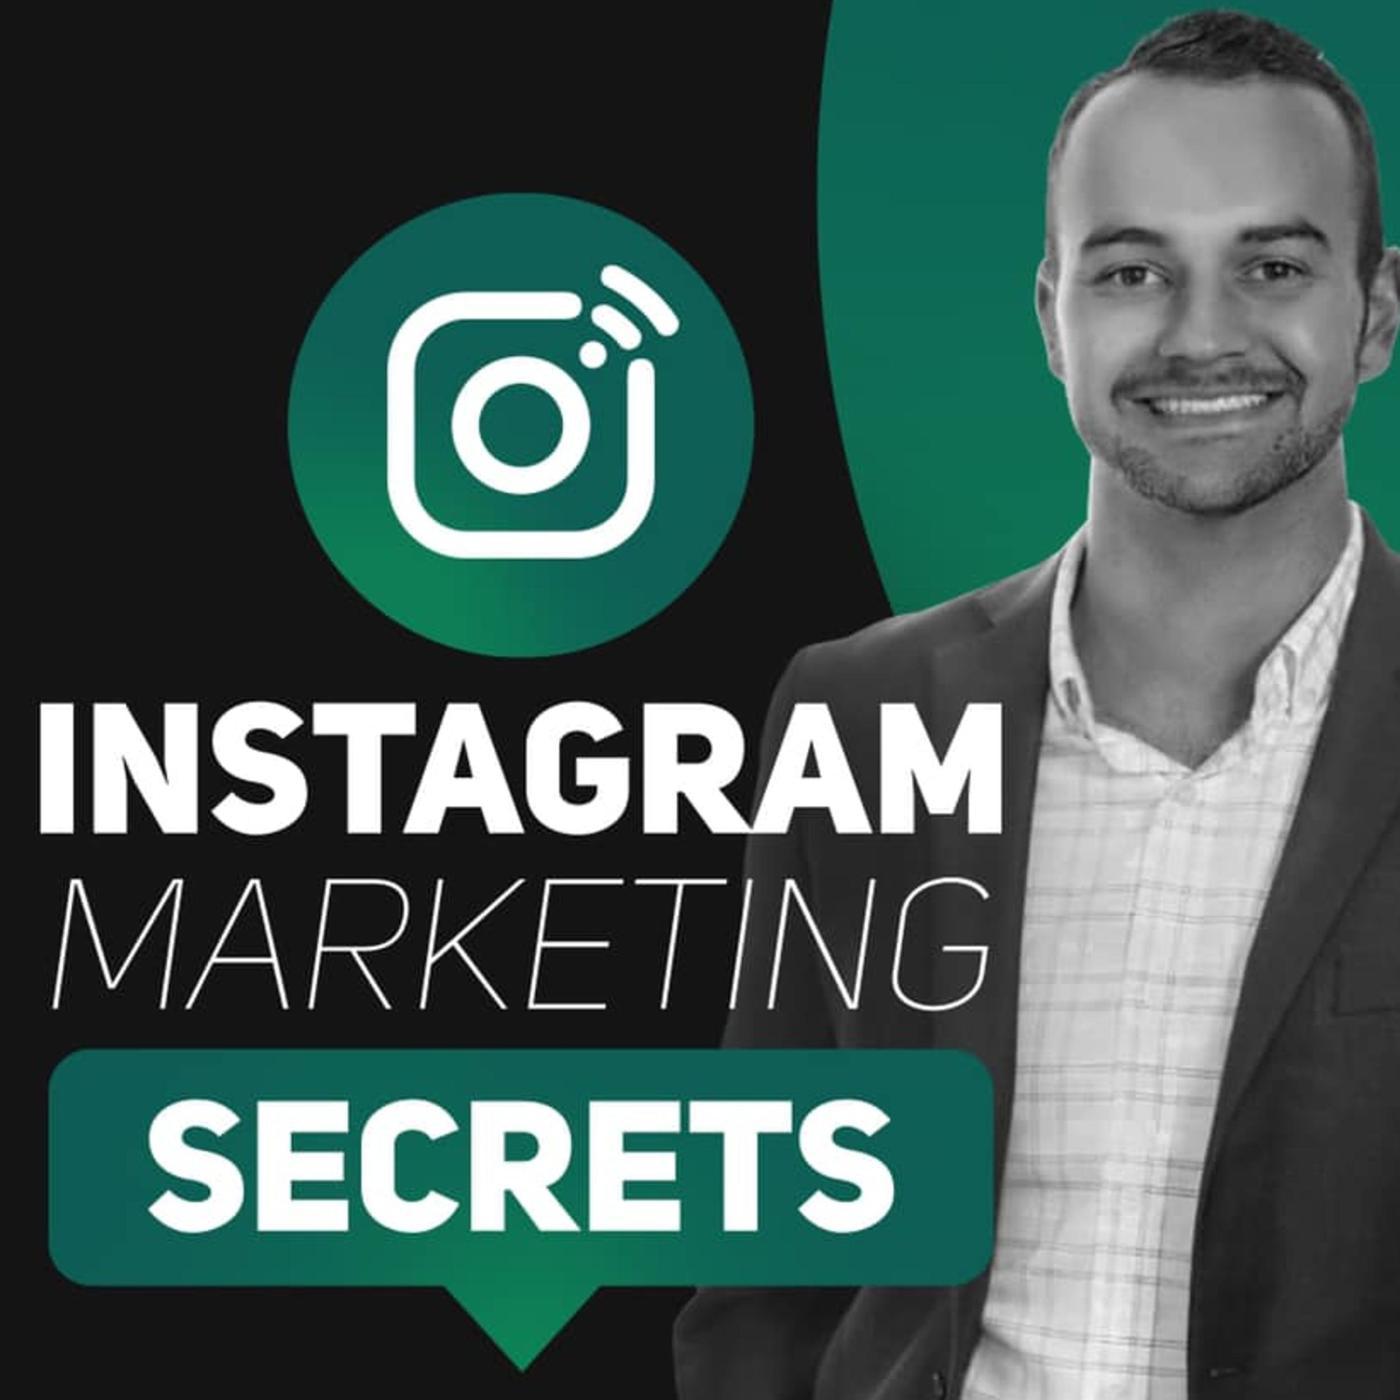 Instagram Marketing Secrets (podcast) - Instagram Marketing Secrets